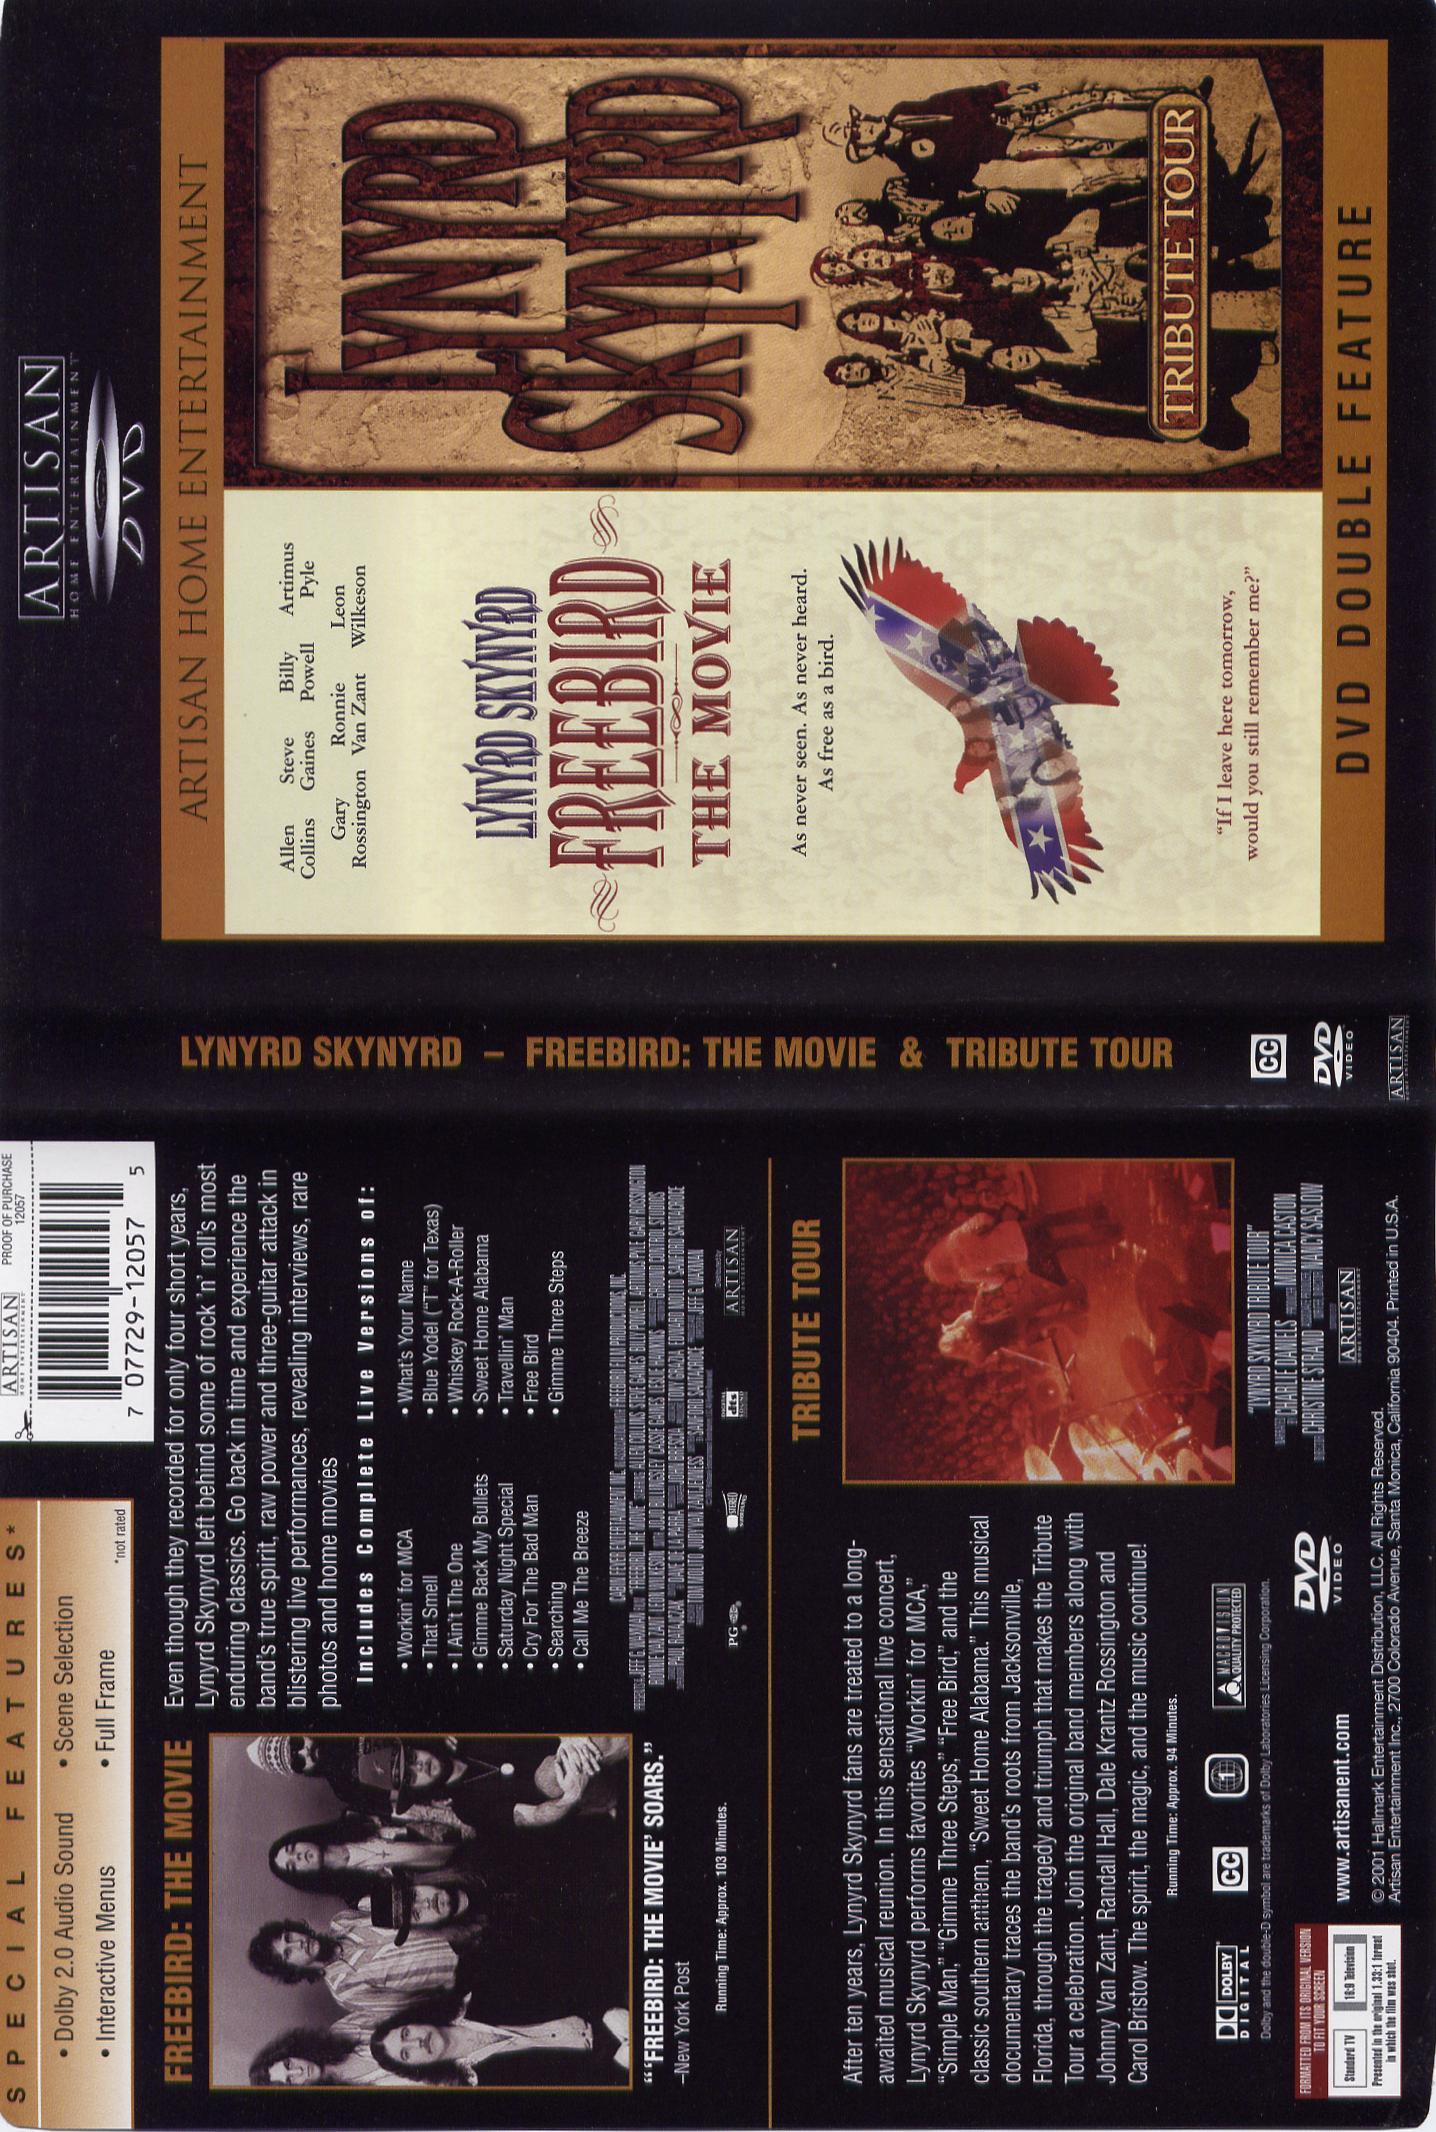 Lynyrd Skynyrd Tribute Tour Dvd